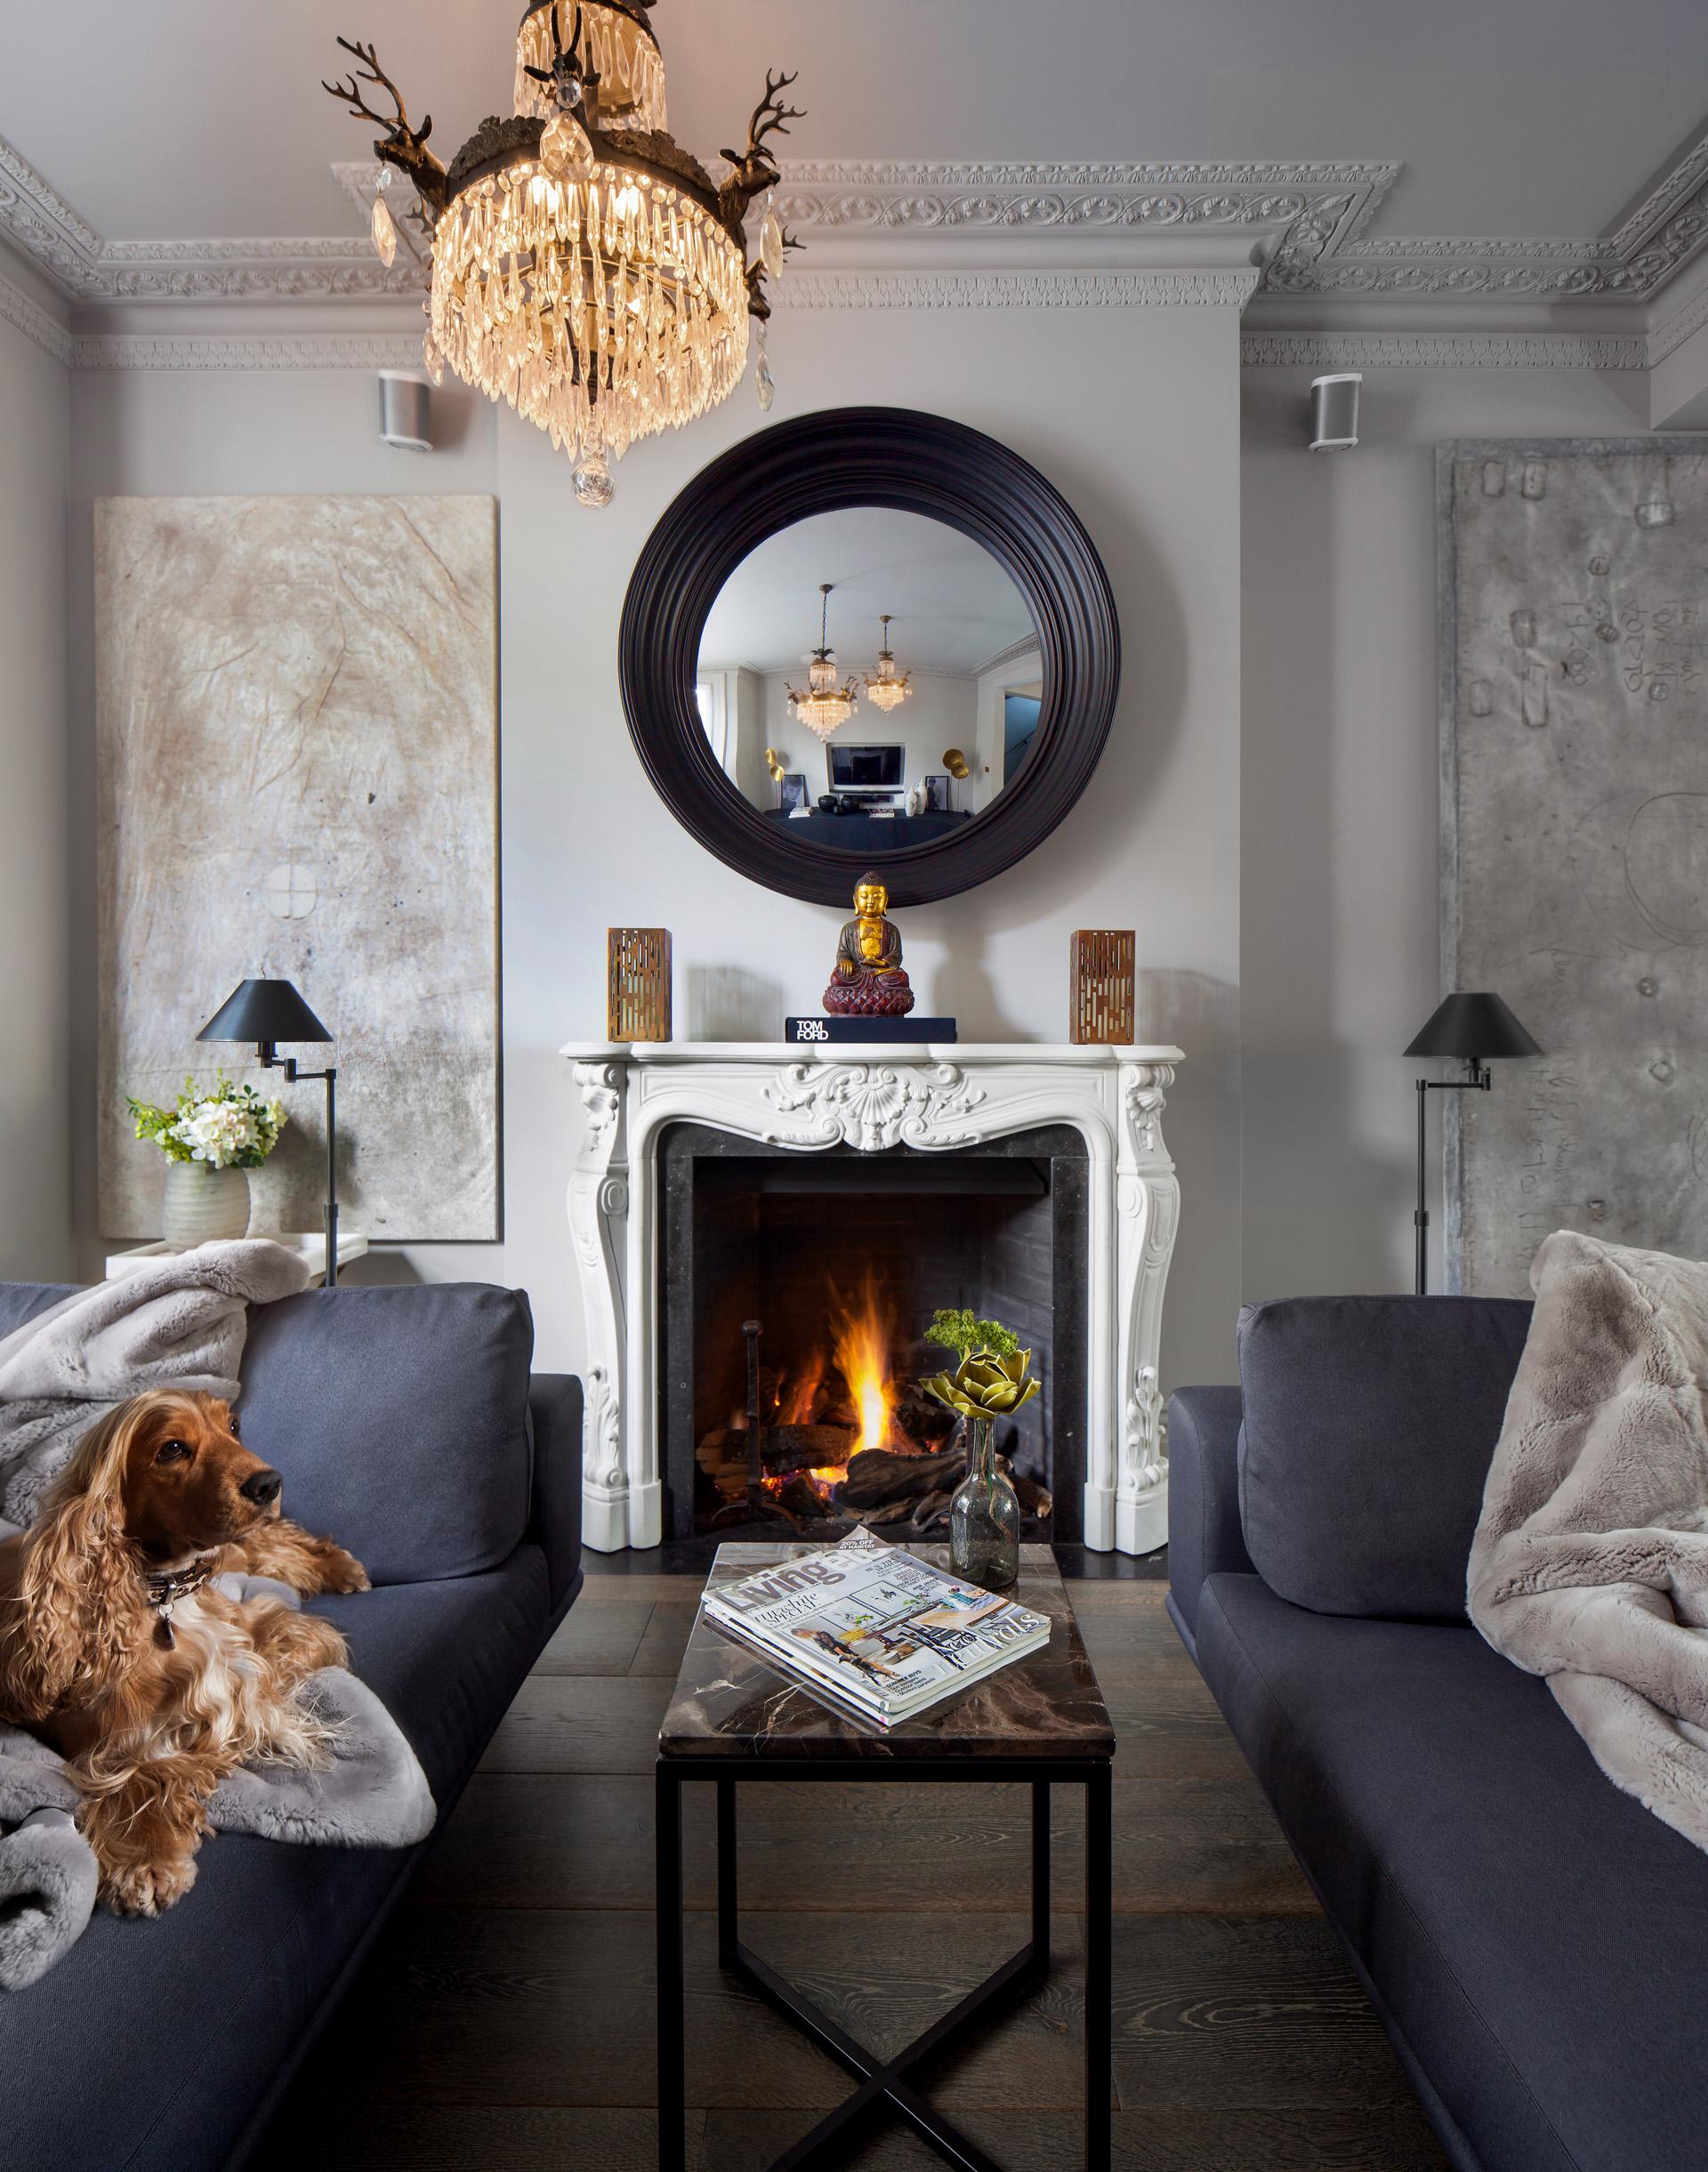 гостиная камин зеркало диван столик